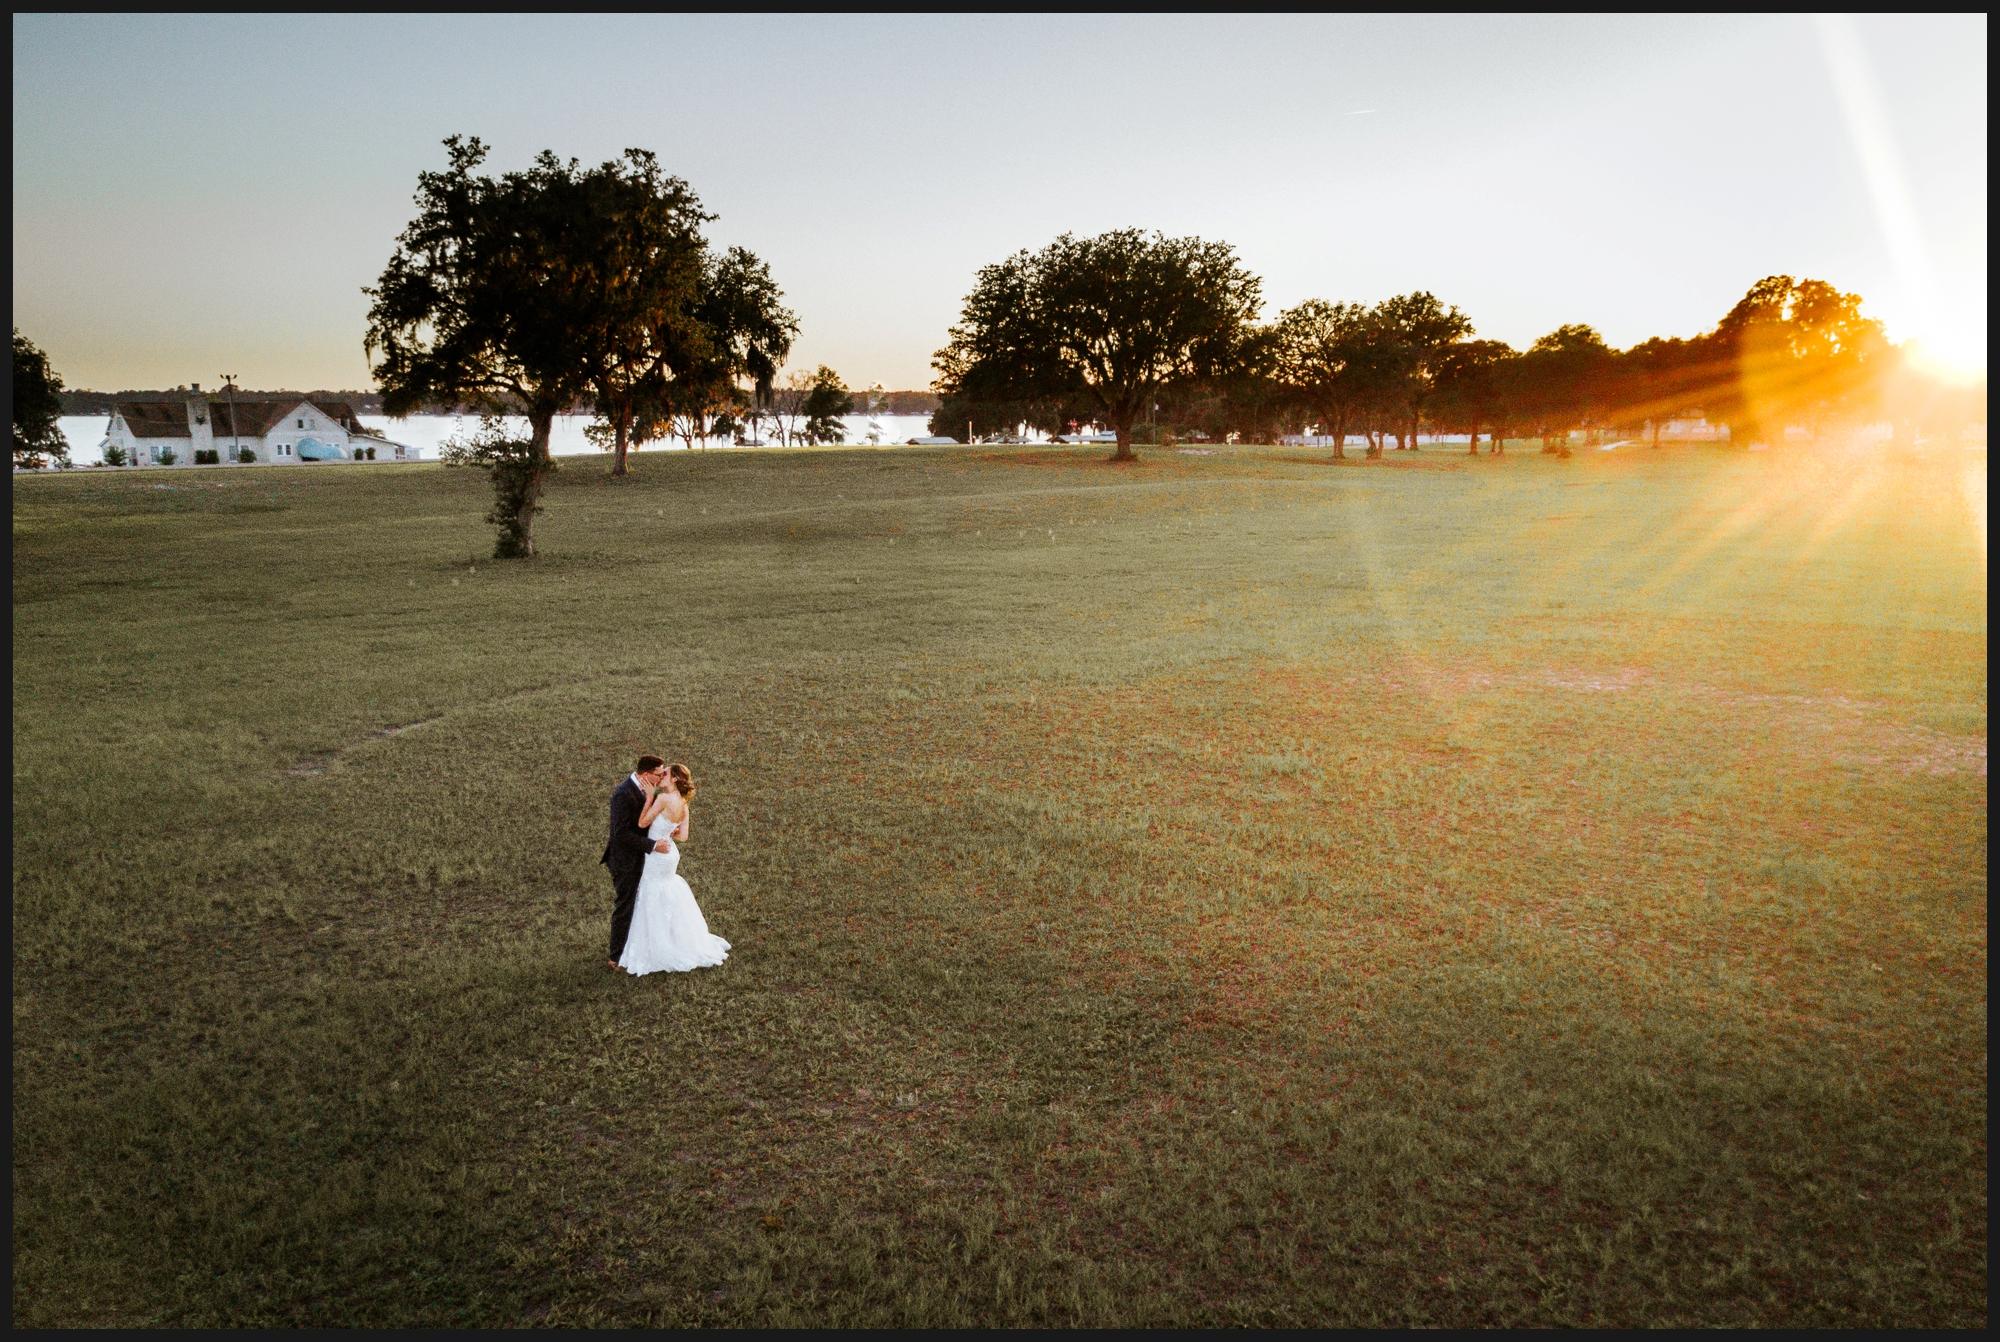 Orlando-Wedding-Photographer-destination-wedding-photographer-florida-wedding-photographer-bohemian-wedding-photographer_0111.jpg